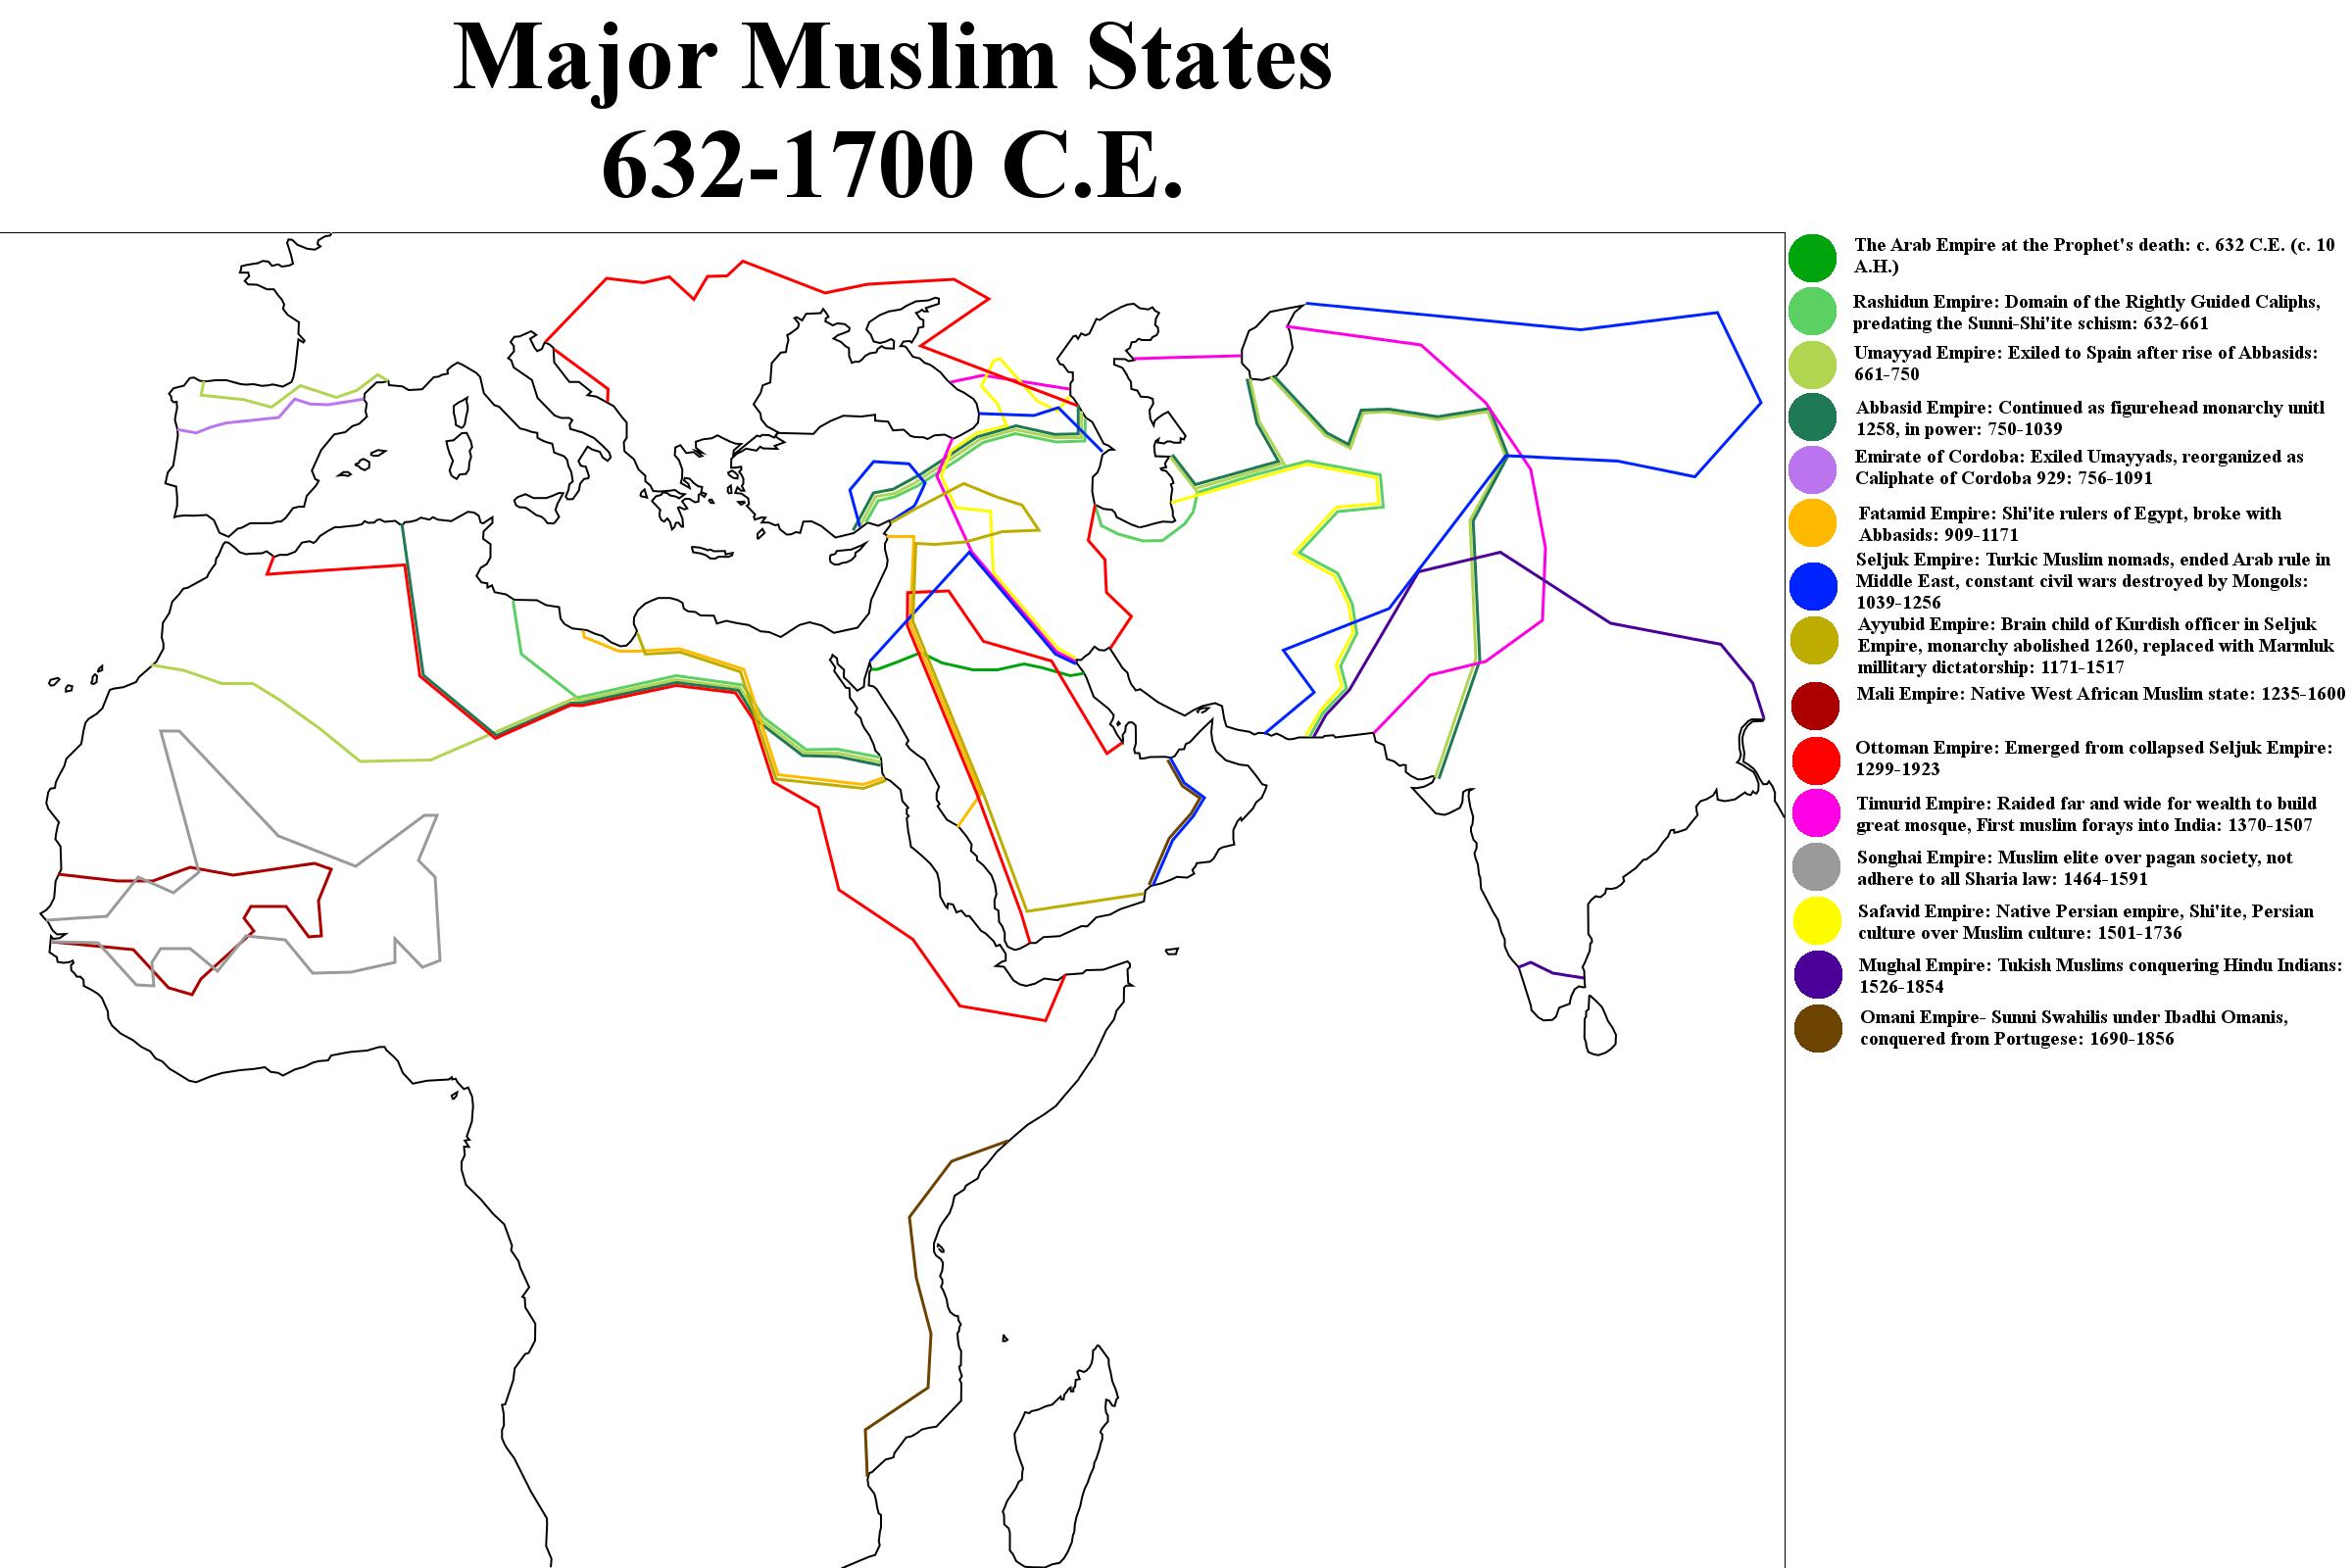 Major Muslim States 632-1700 C E  by AlexanderAbelard on DeviantArt